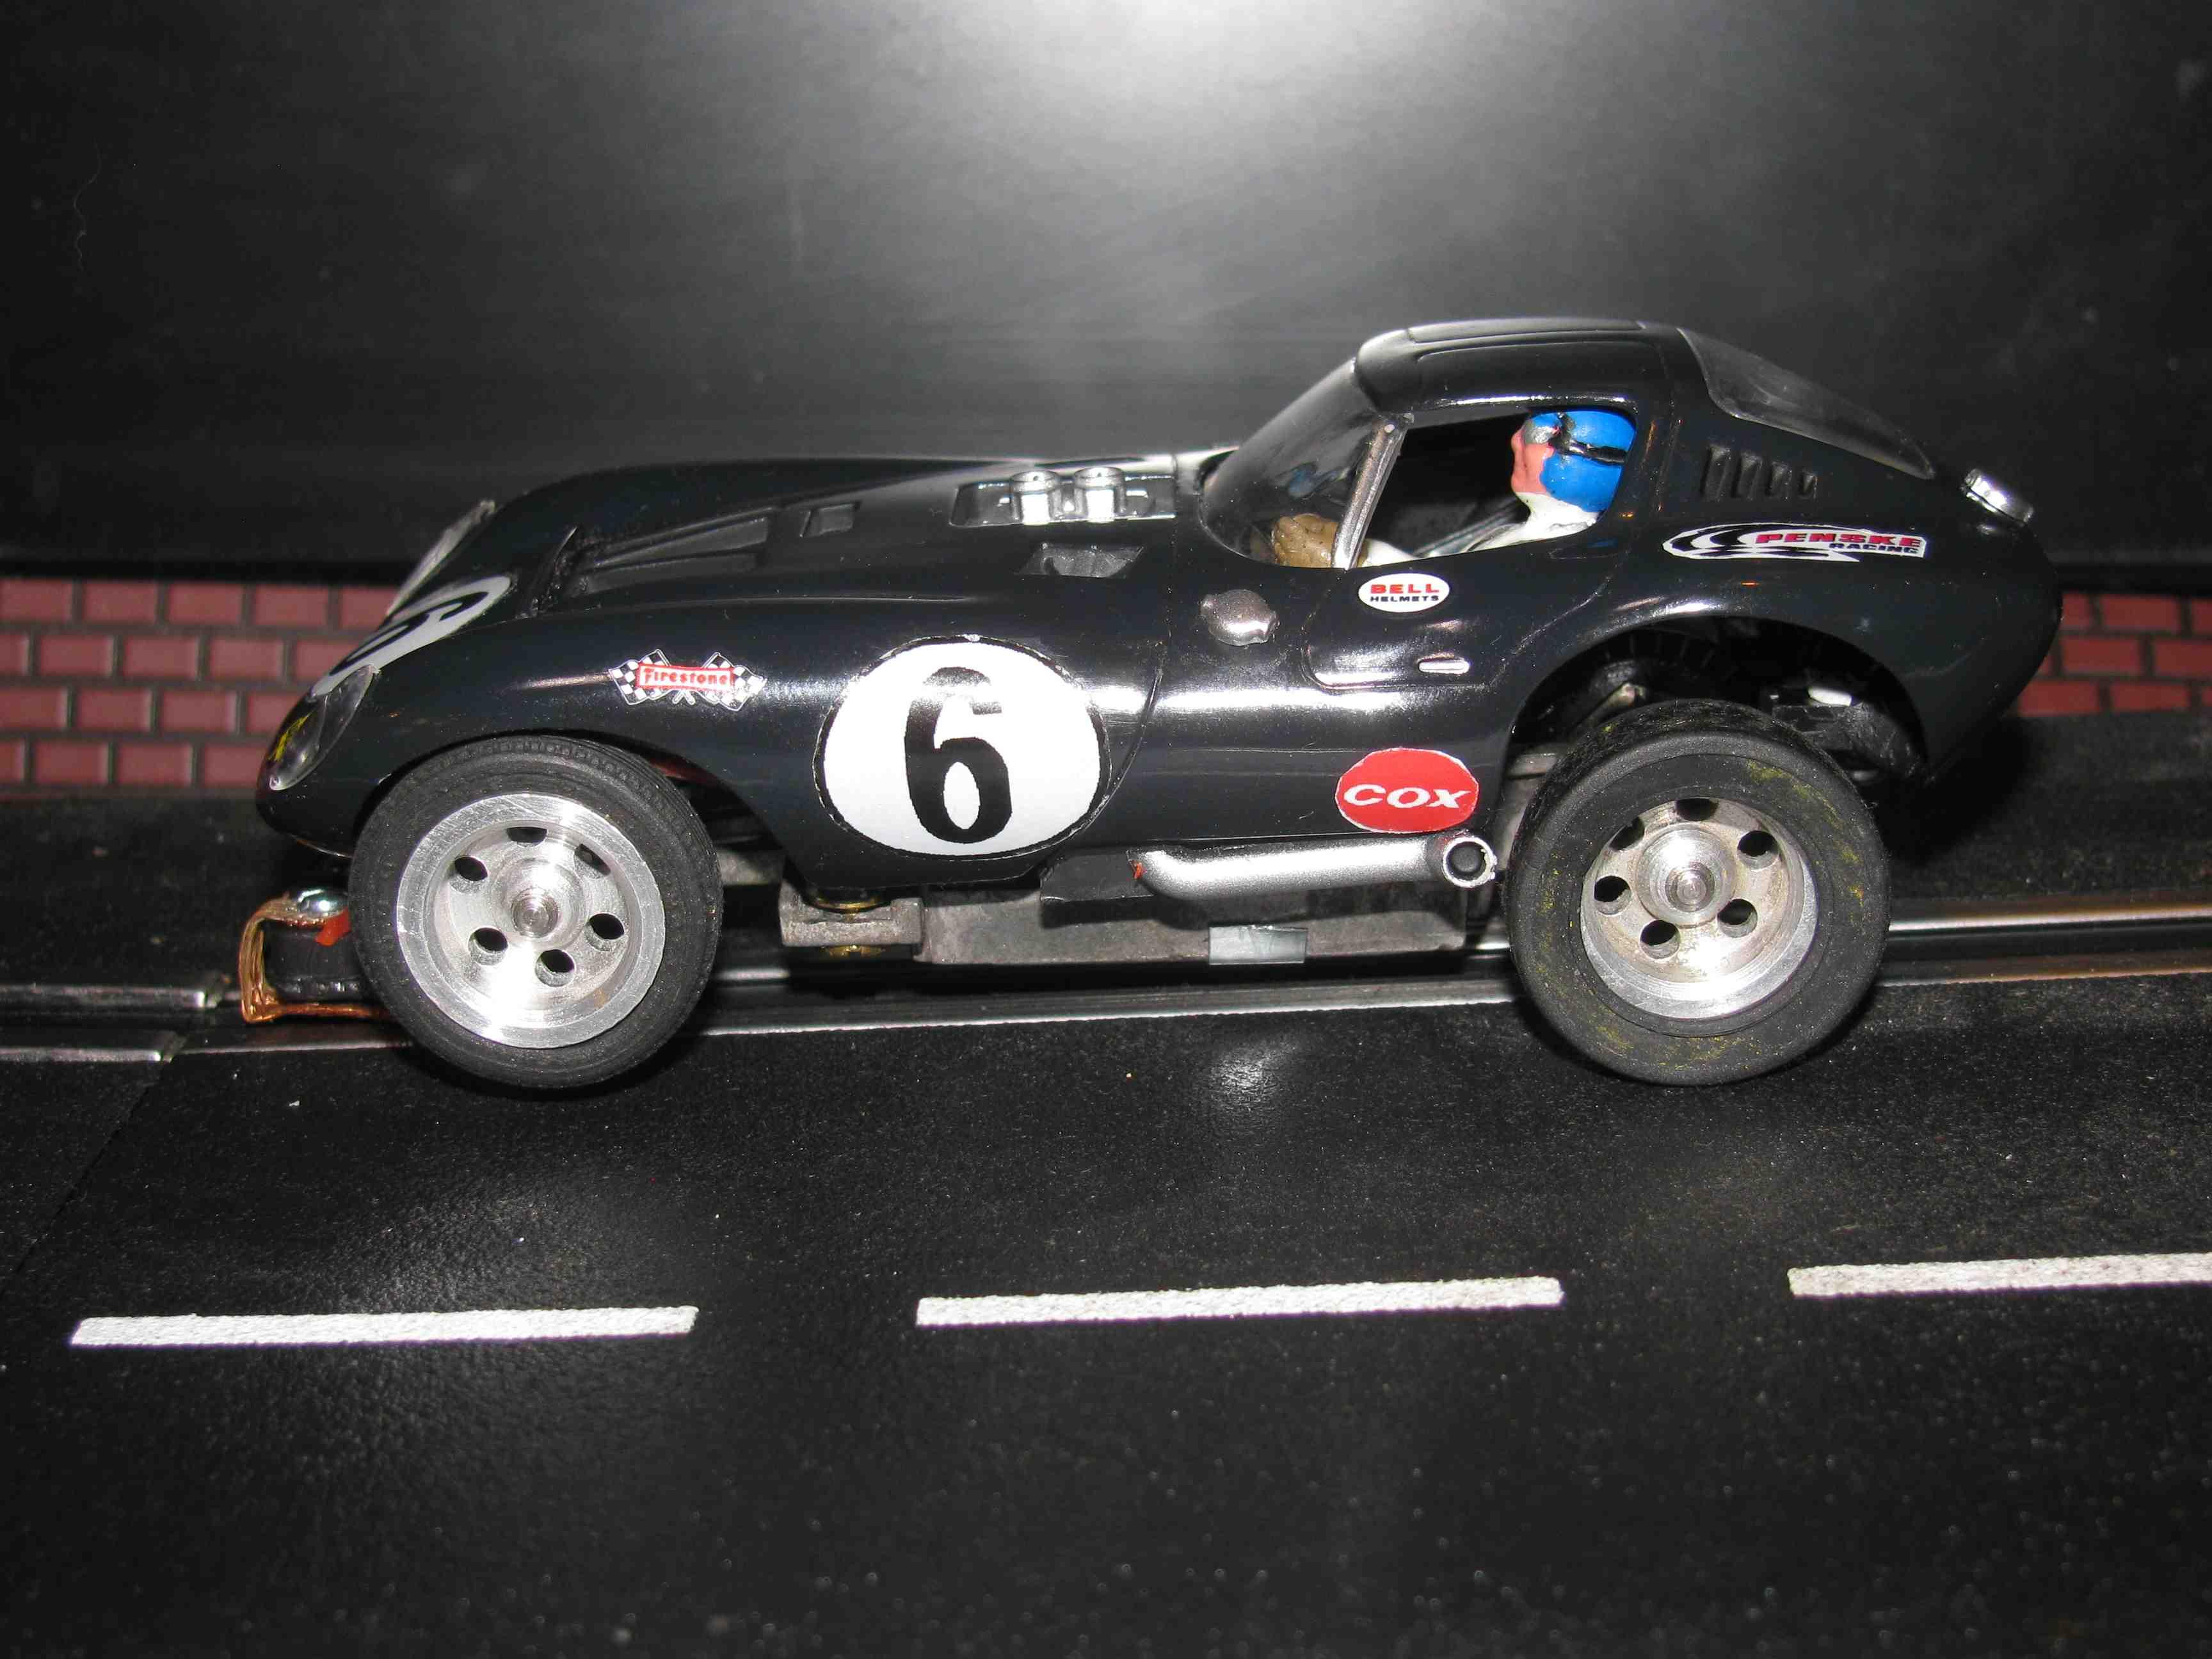 * SOLD * Vintage COX Cheetah Slot Car 1/32 Scale – Black – Car #6 – Bill Thomas's Cobra & Ferrari Fighter